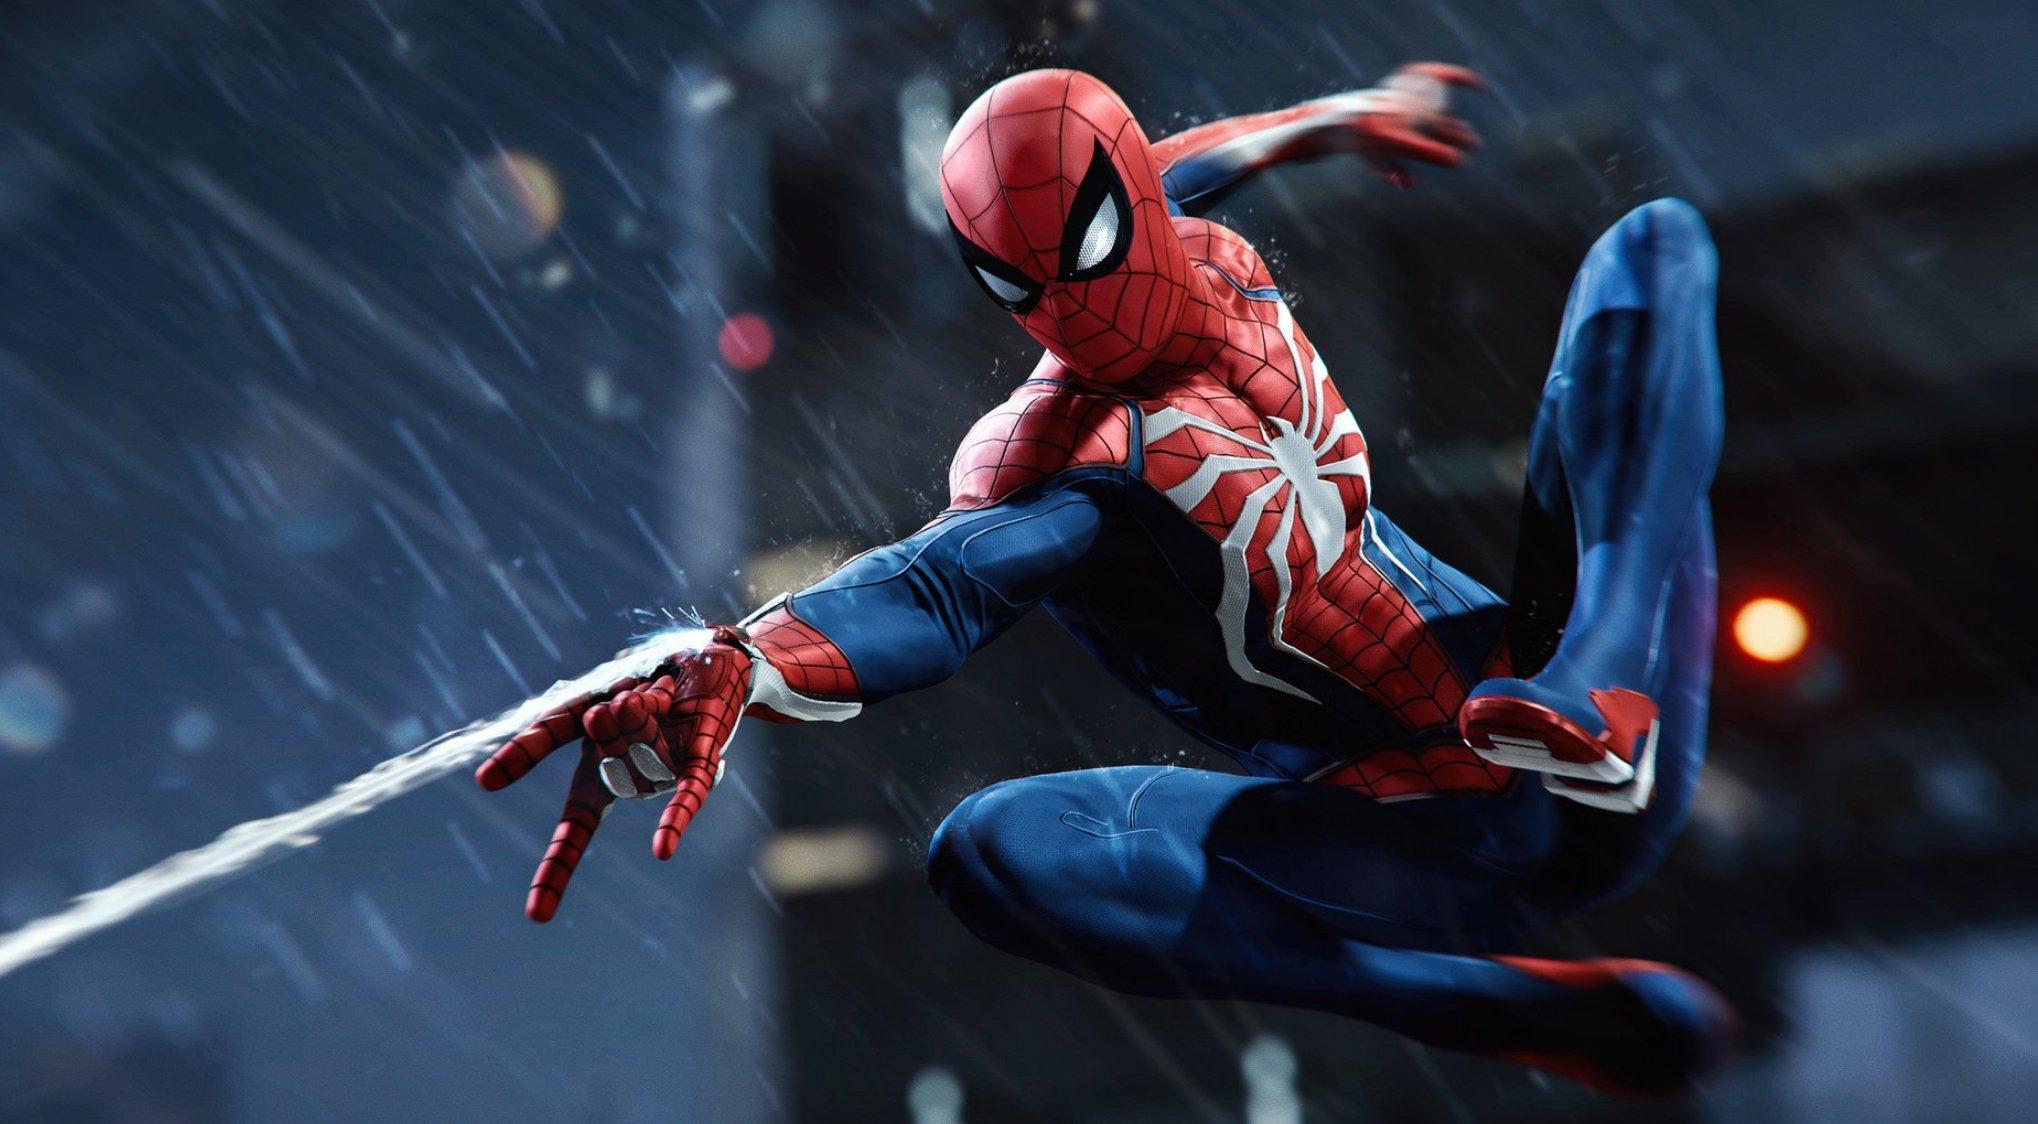 New Hands-On Details For Insomniac Games' Spider-Man https://t.co/6N3B5F3rR1 https://t.co/XyoPOJKhWk